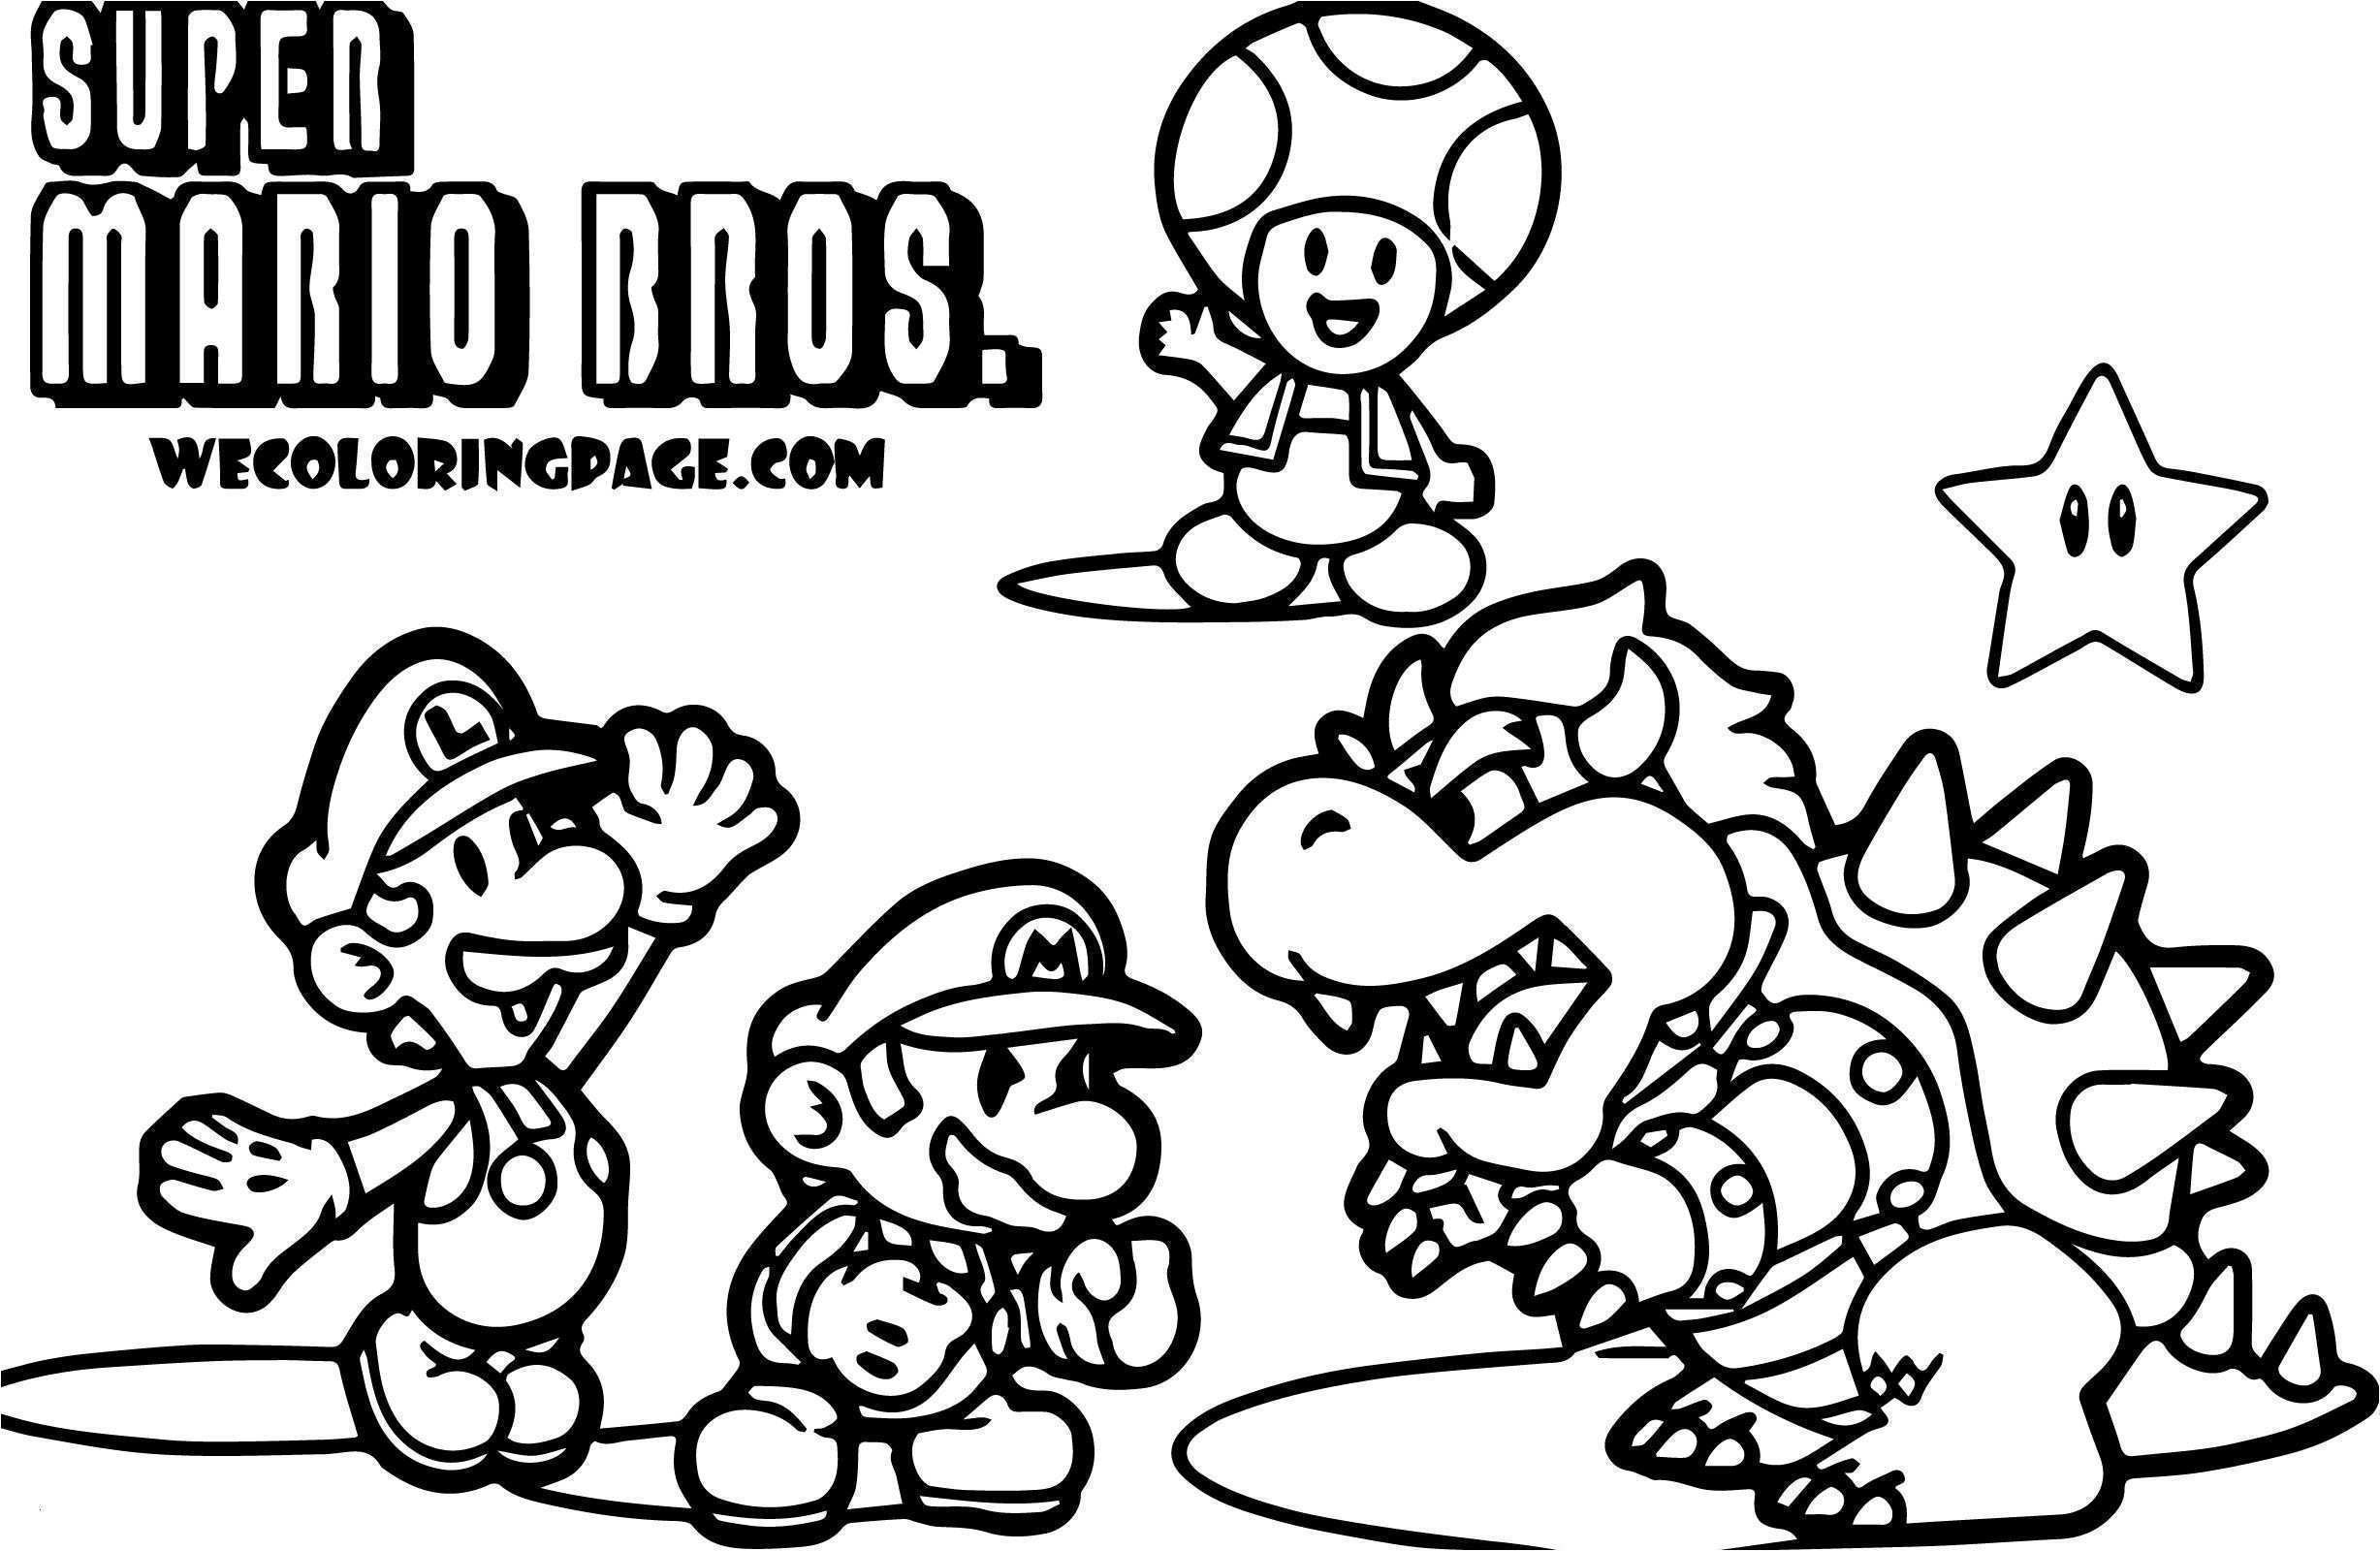 Ausmalbilder Mario Einzigartig Mario Coloriage Idees Fluch Coloriage Mario Kart Luigi Ideas 35 Das Bild